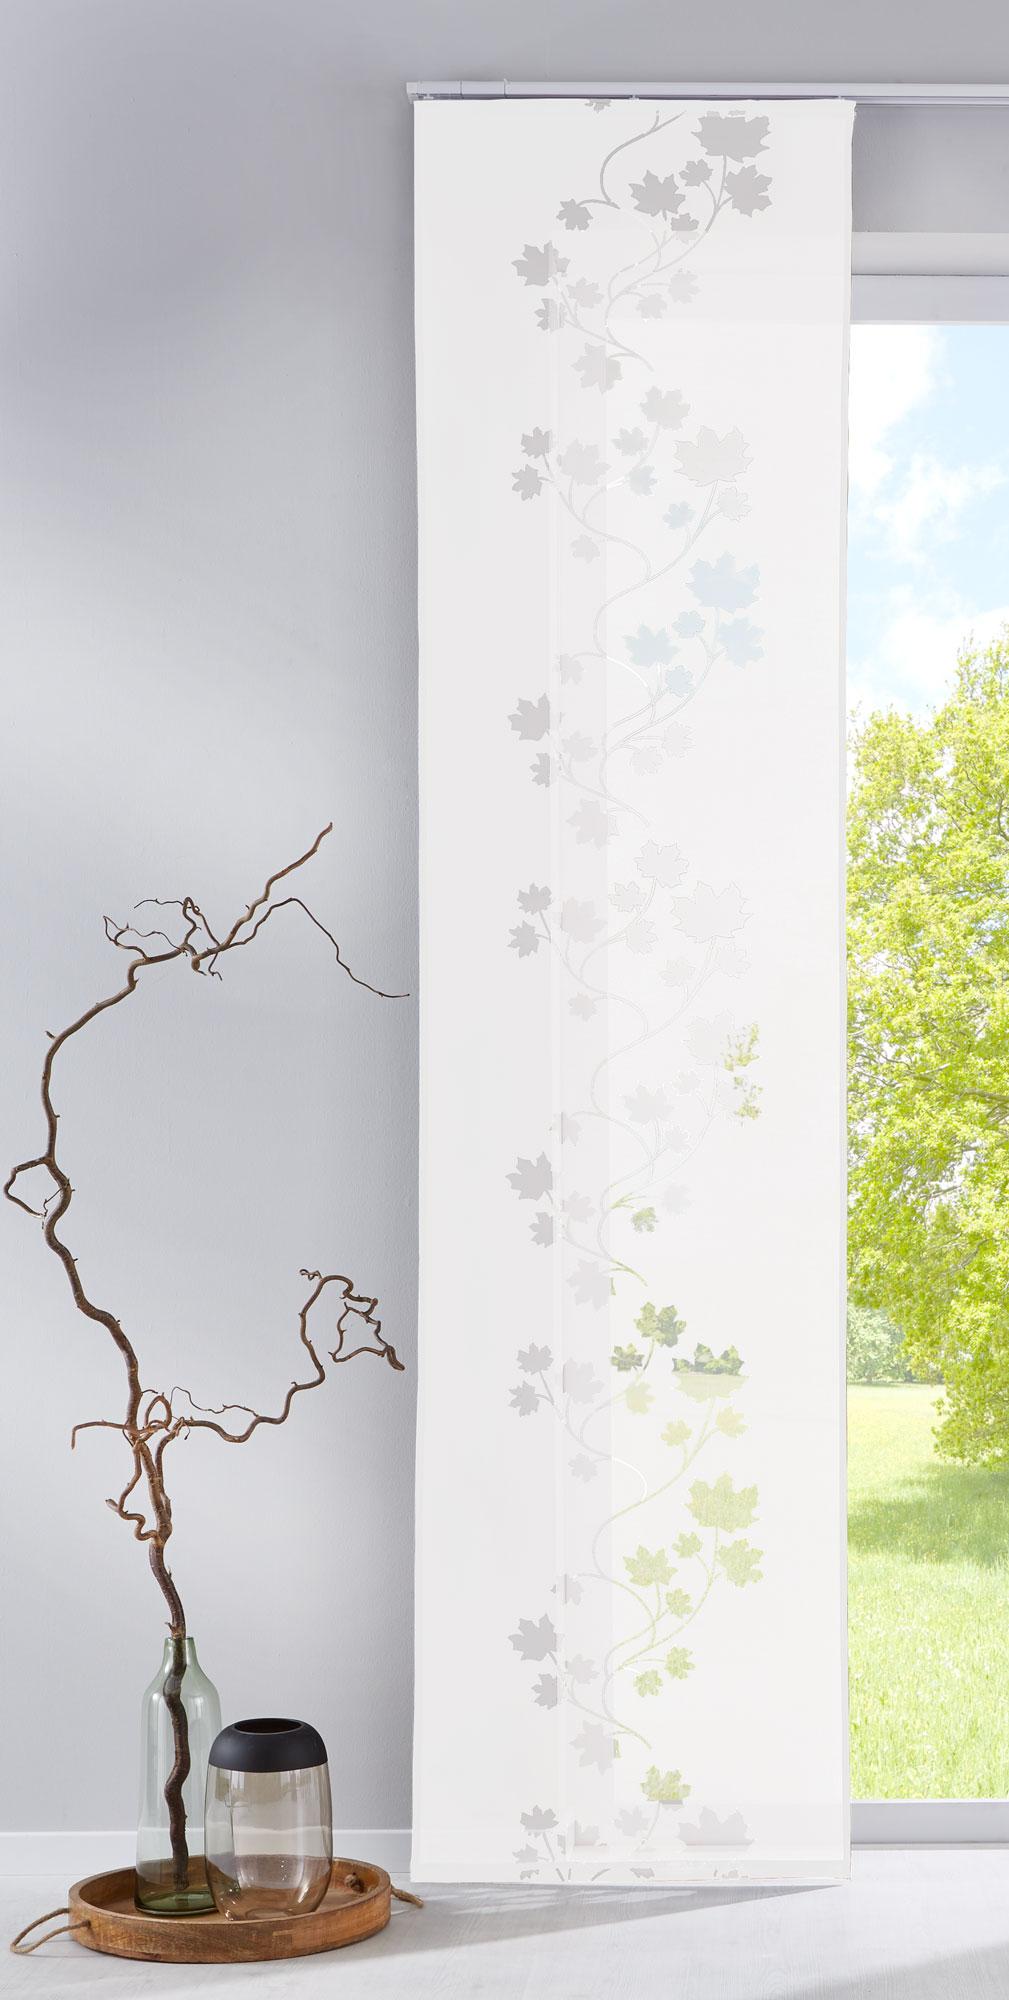 fl chenvorhang schiebegardine mit klettband ausbrenner leaf 85610 ebay. Black Bedroom Furniture Sets. Home Design Ideas